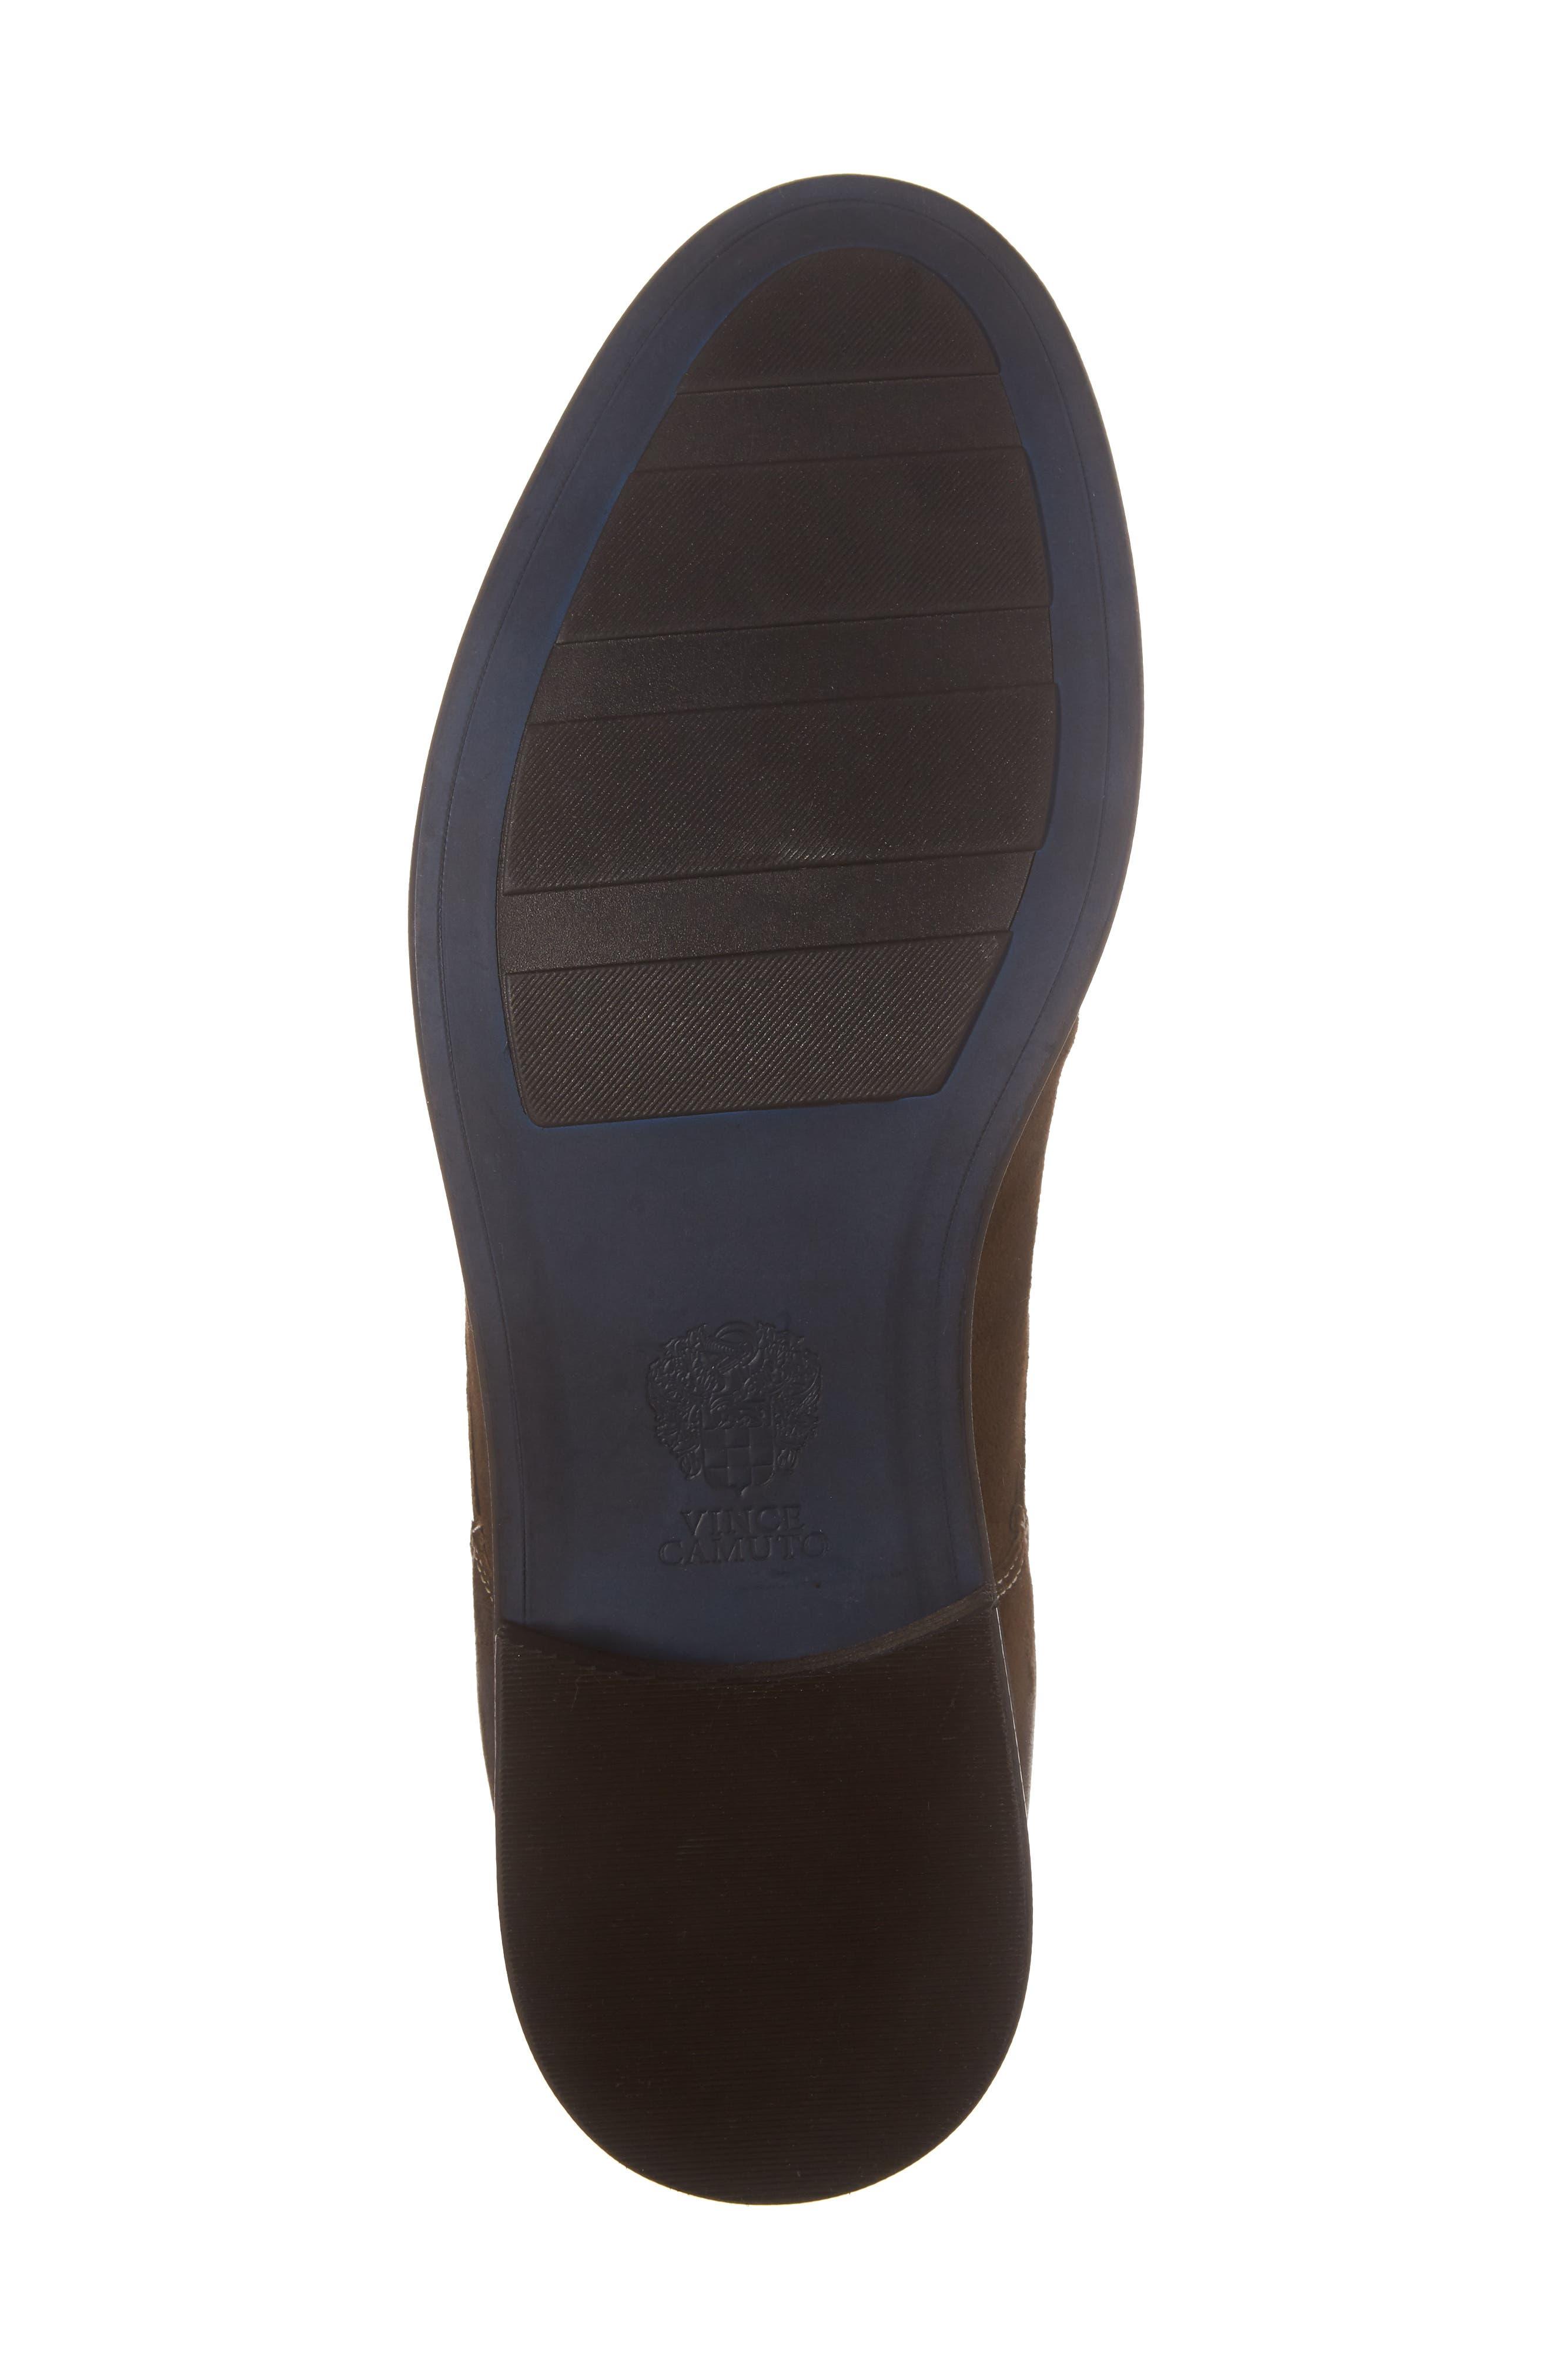 Cordie Plain Toe Boot,                             Alternate thumbnail 6, color,                             Oliva Suede